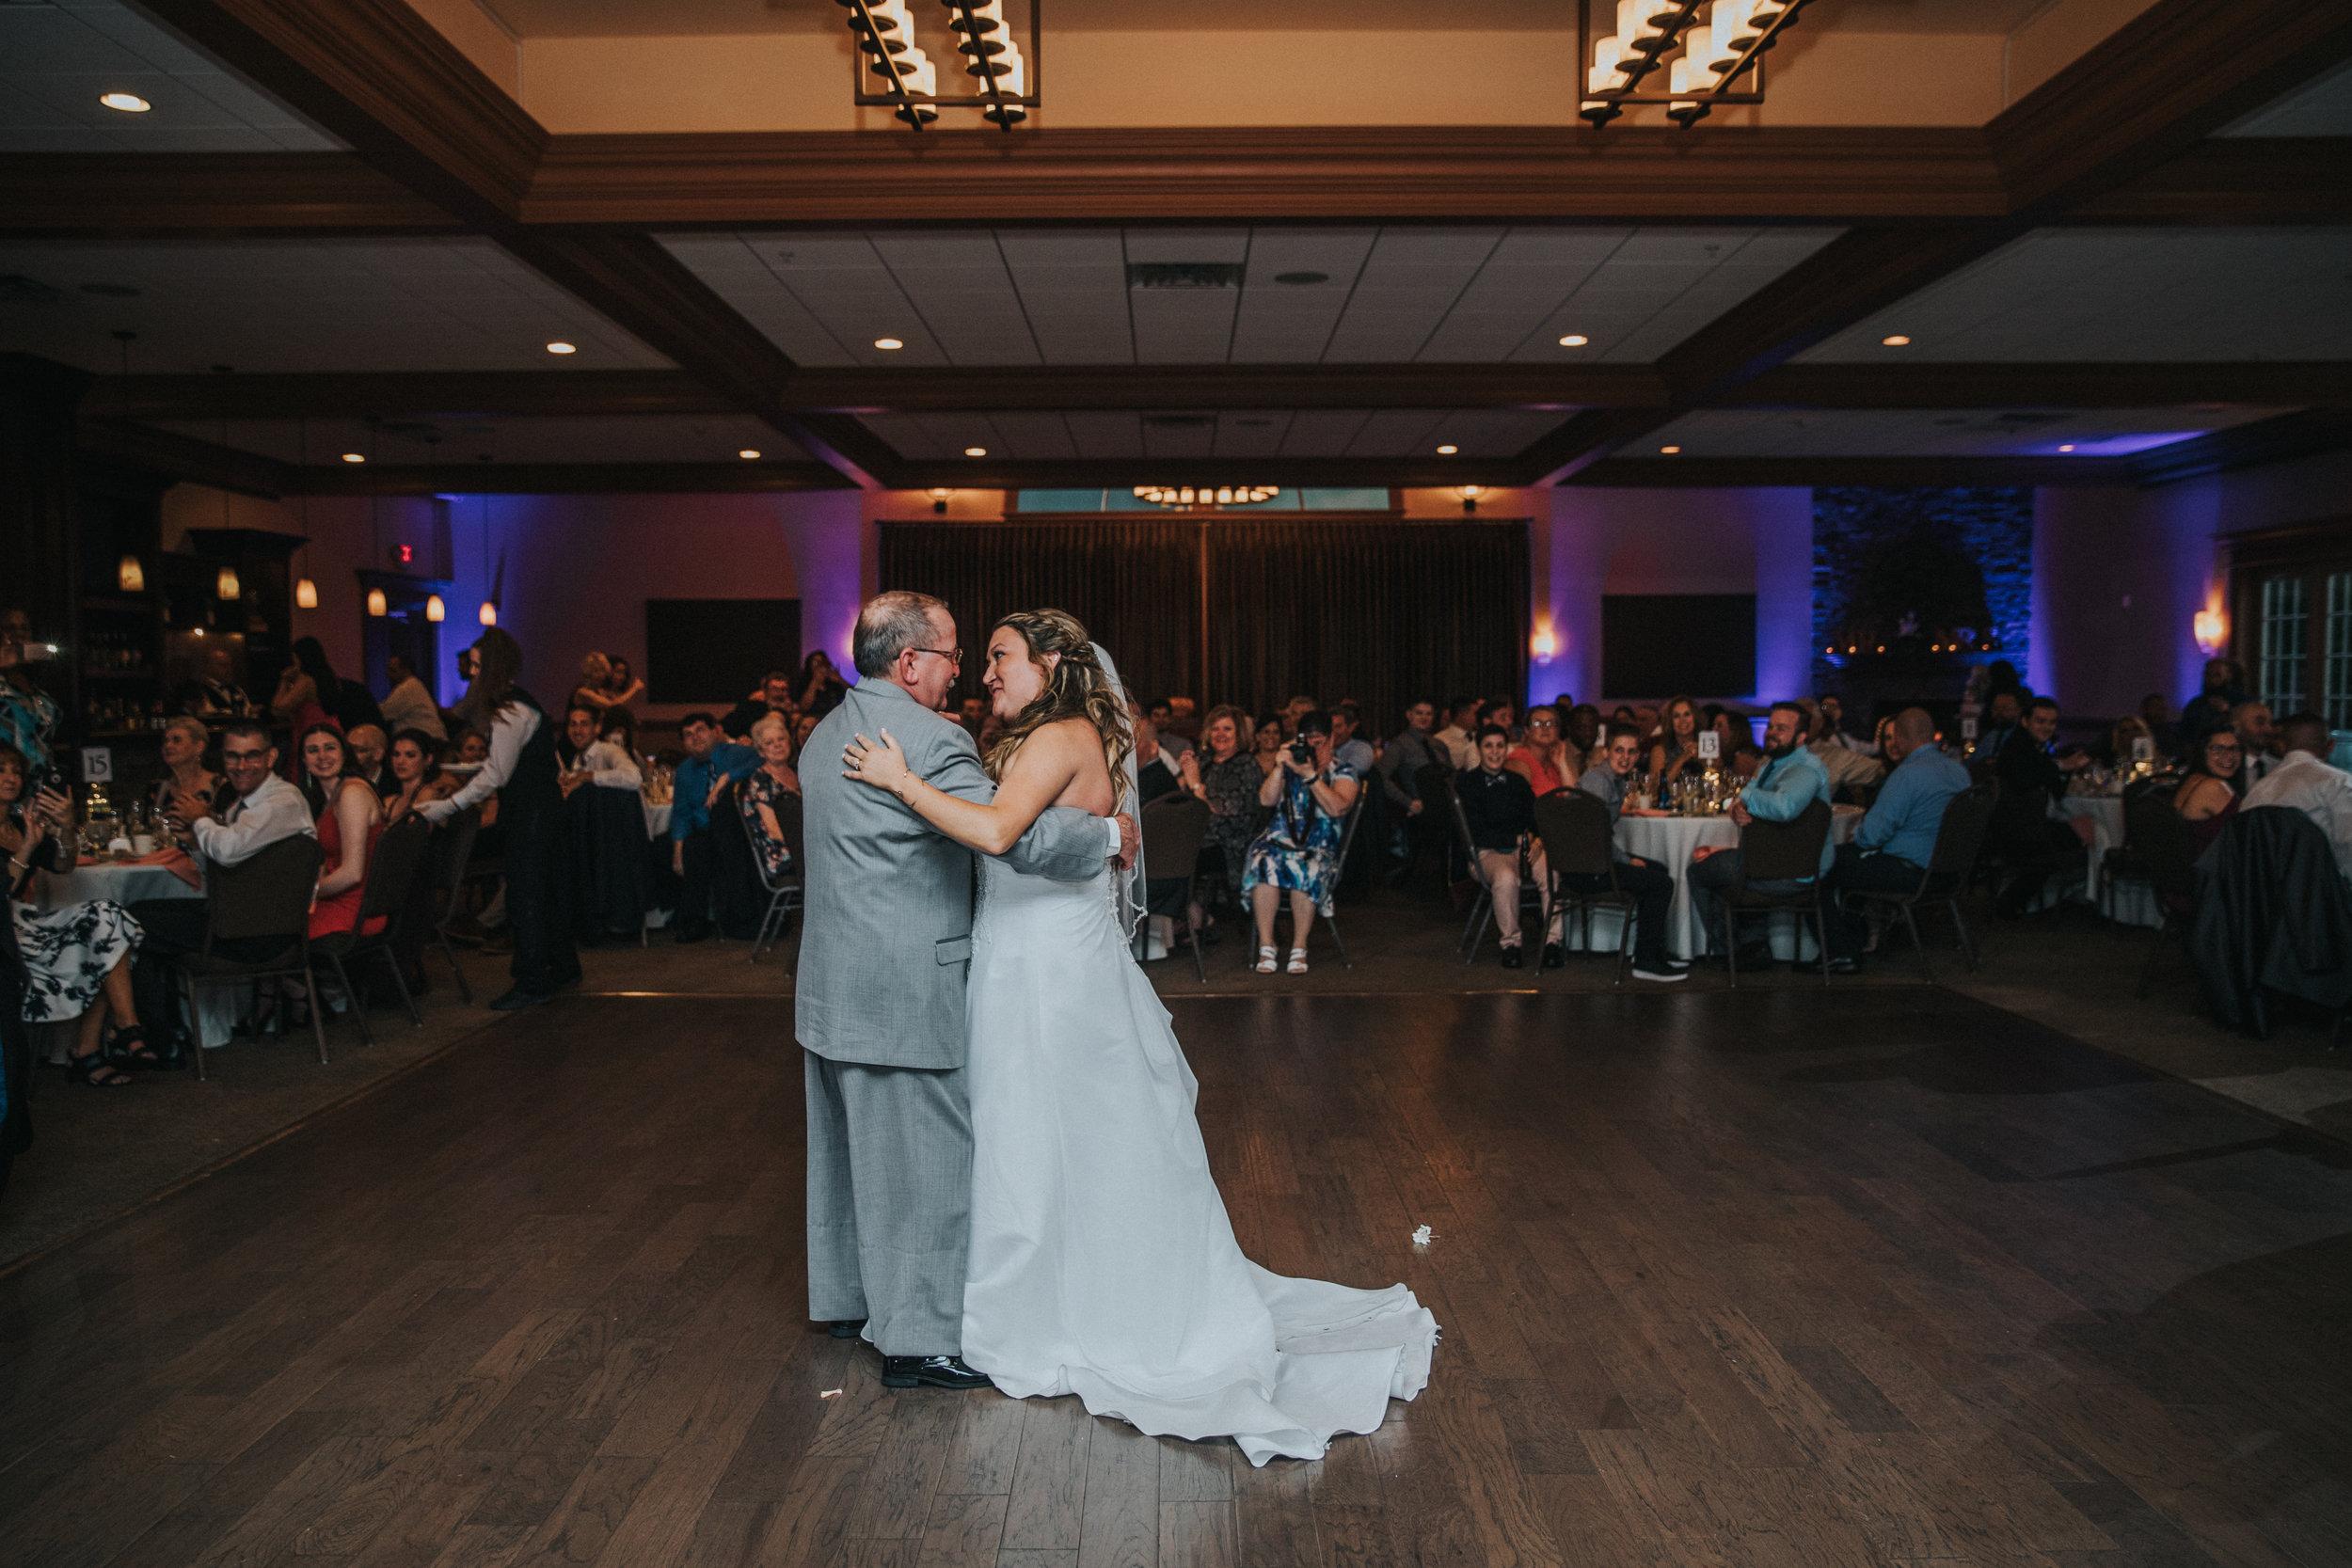 New-Jersey-Wedding-Photographer-JennaLynnPhotography-ValenzanoWinery-Reception-58.jpg